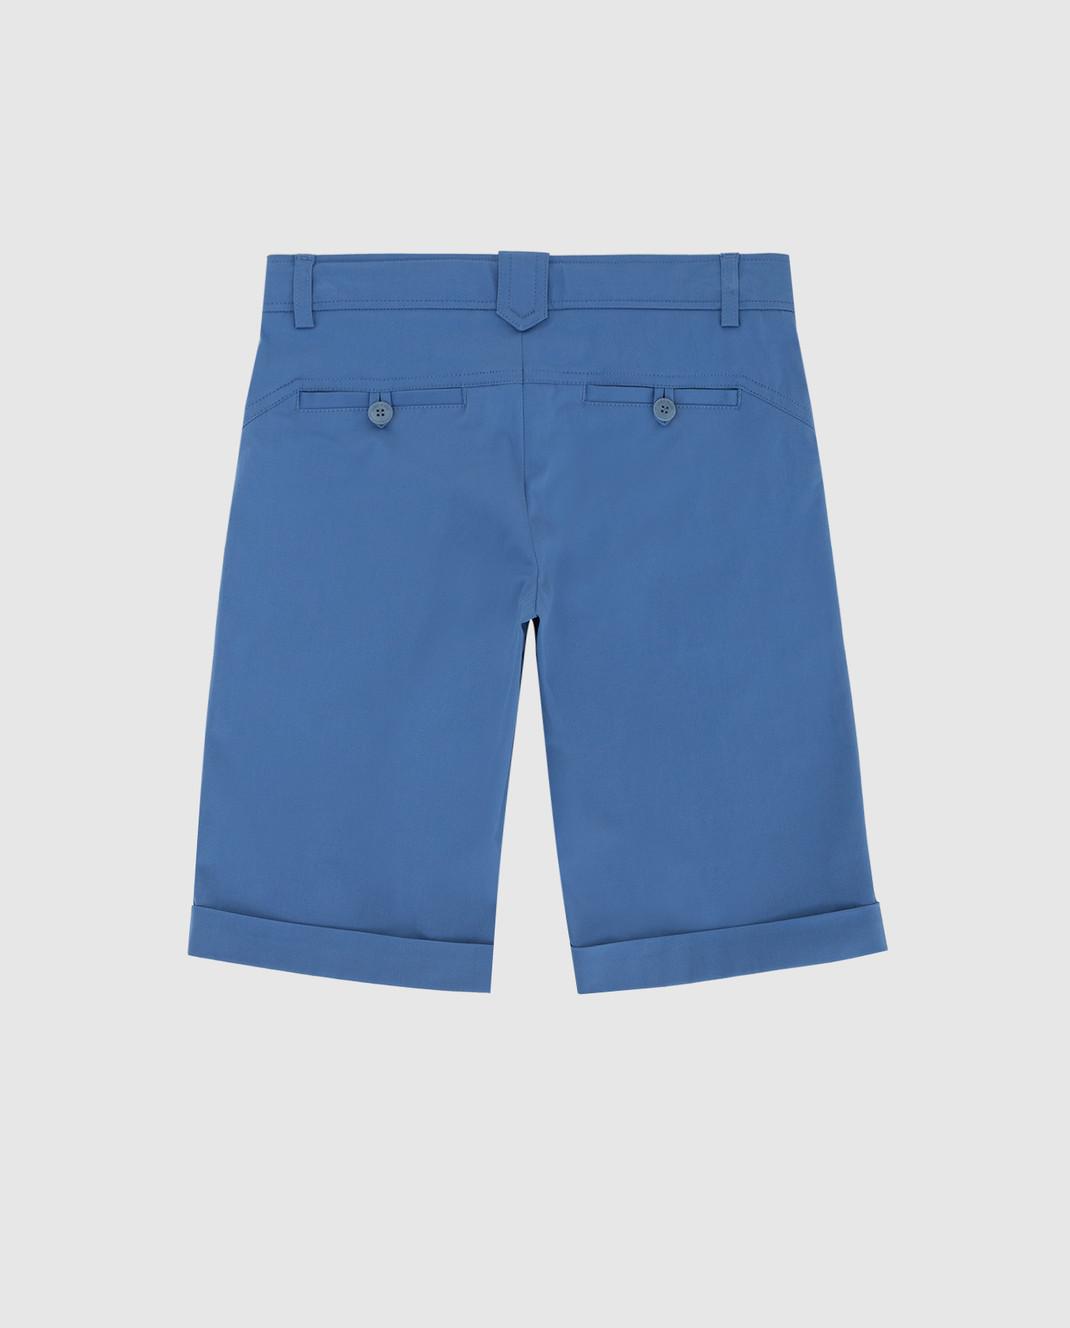 Loro Piana Детские синие шорты F1FAG1907 изображение 2